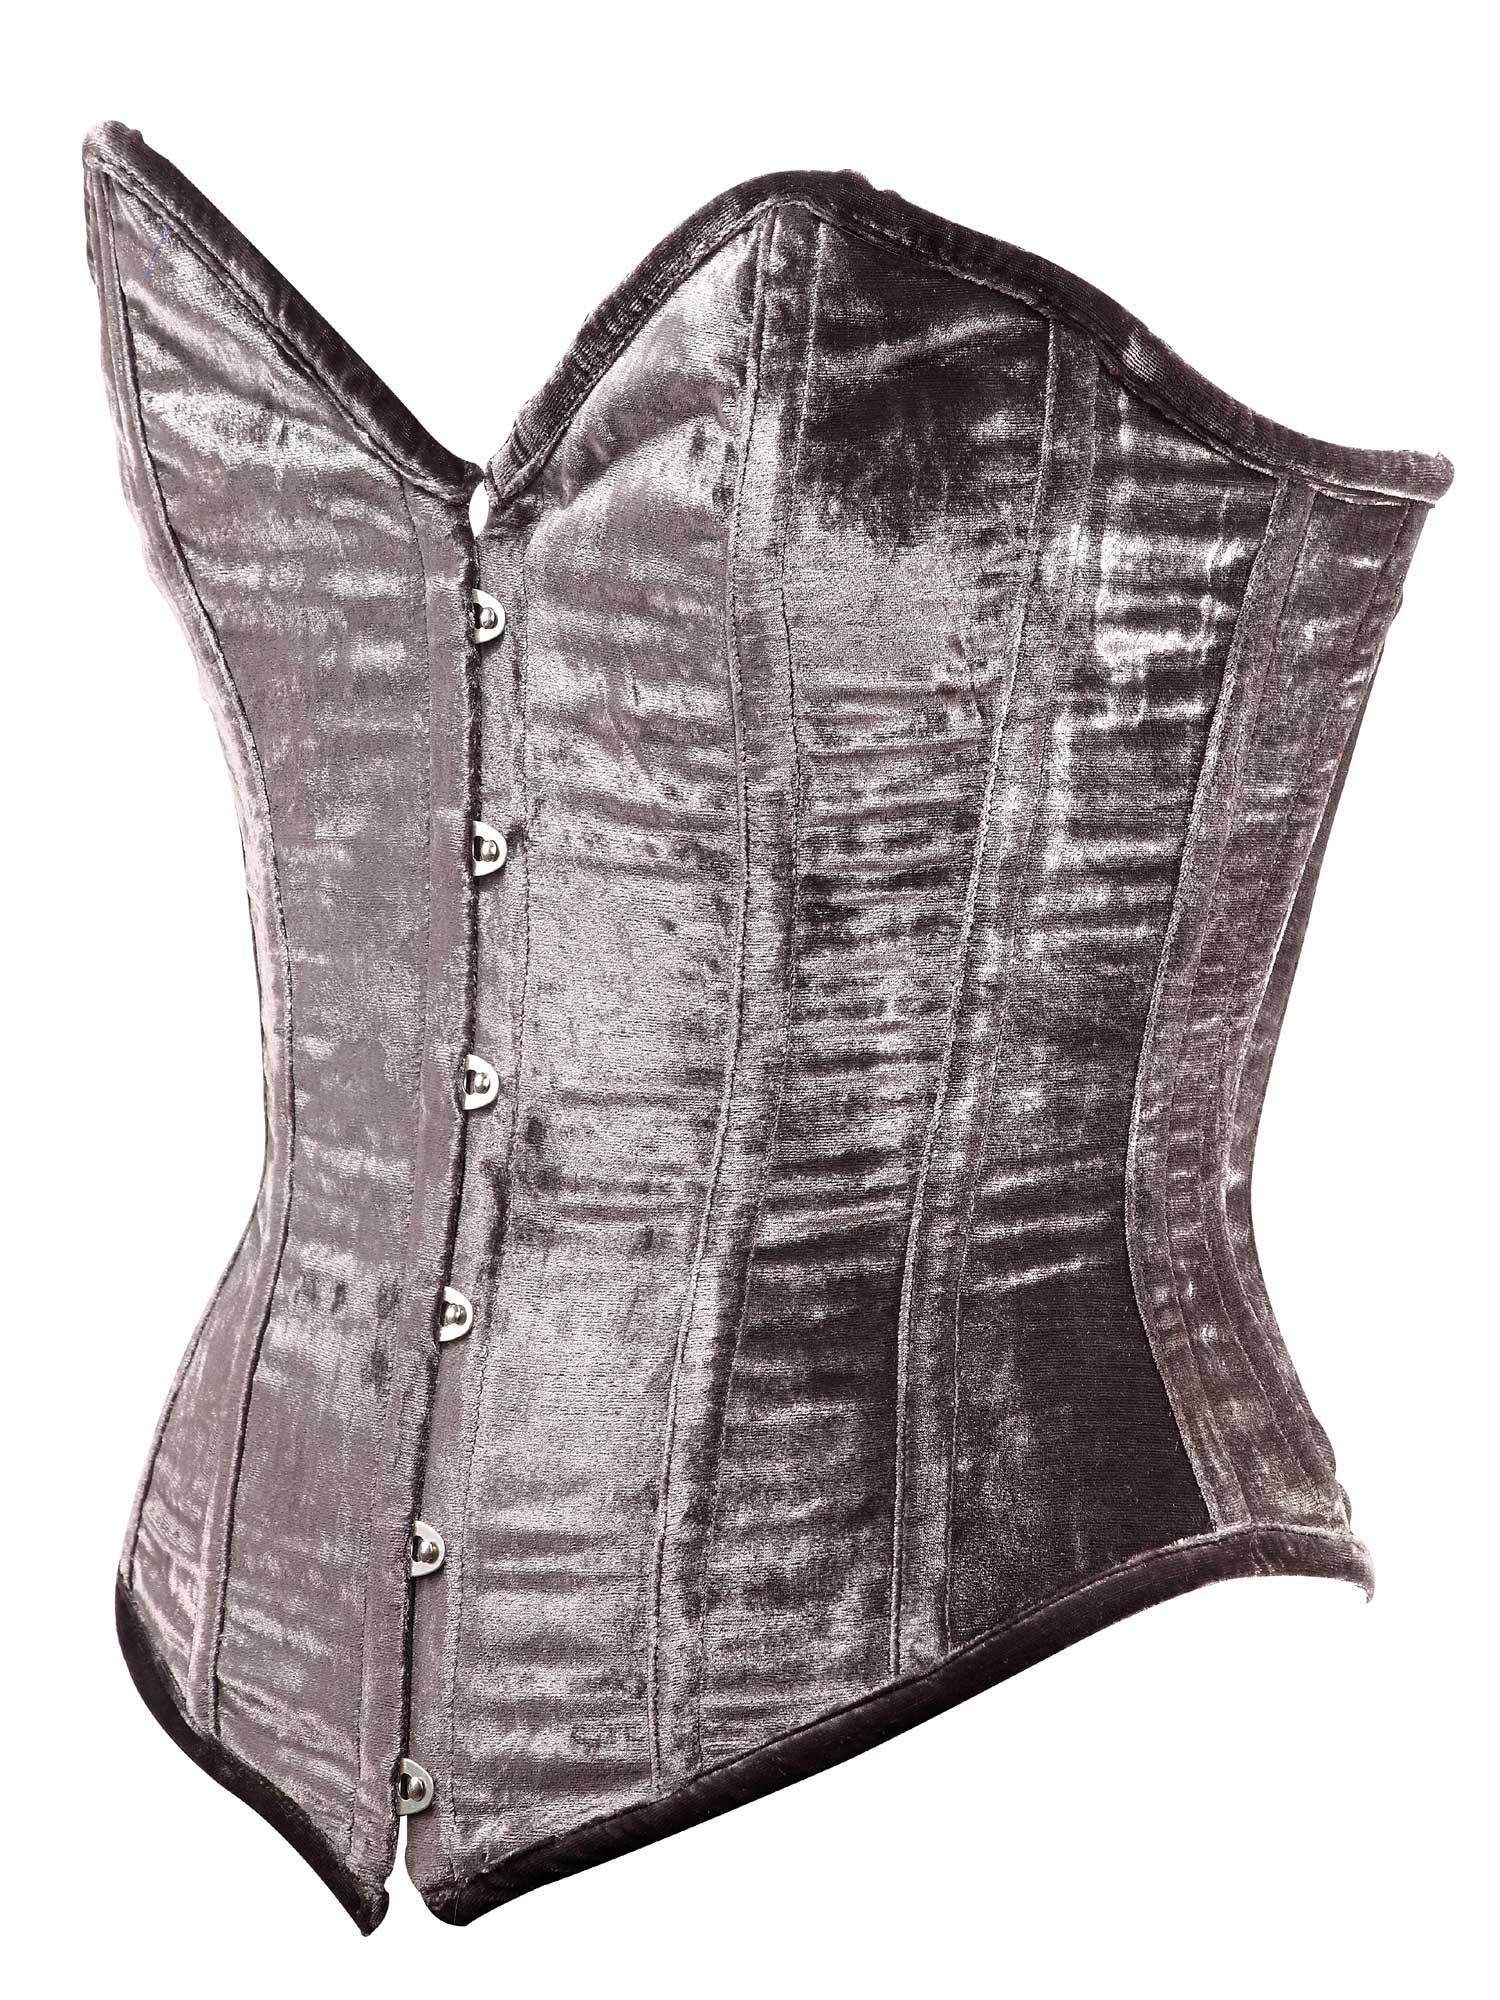 sand_color_velvet_fabric_steel_boning_corset_waist_cincher_bustier_bustiers_and_corsets_4.jpg